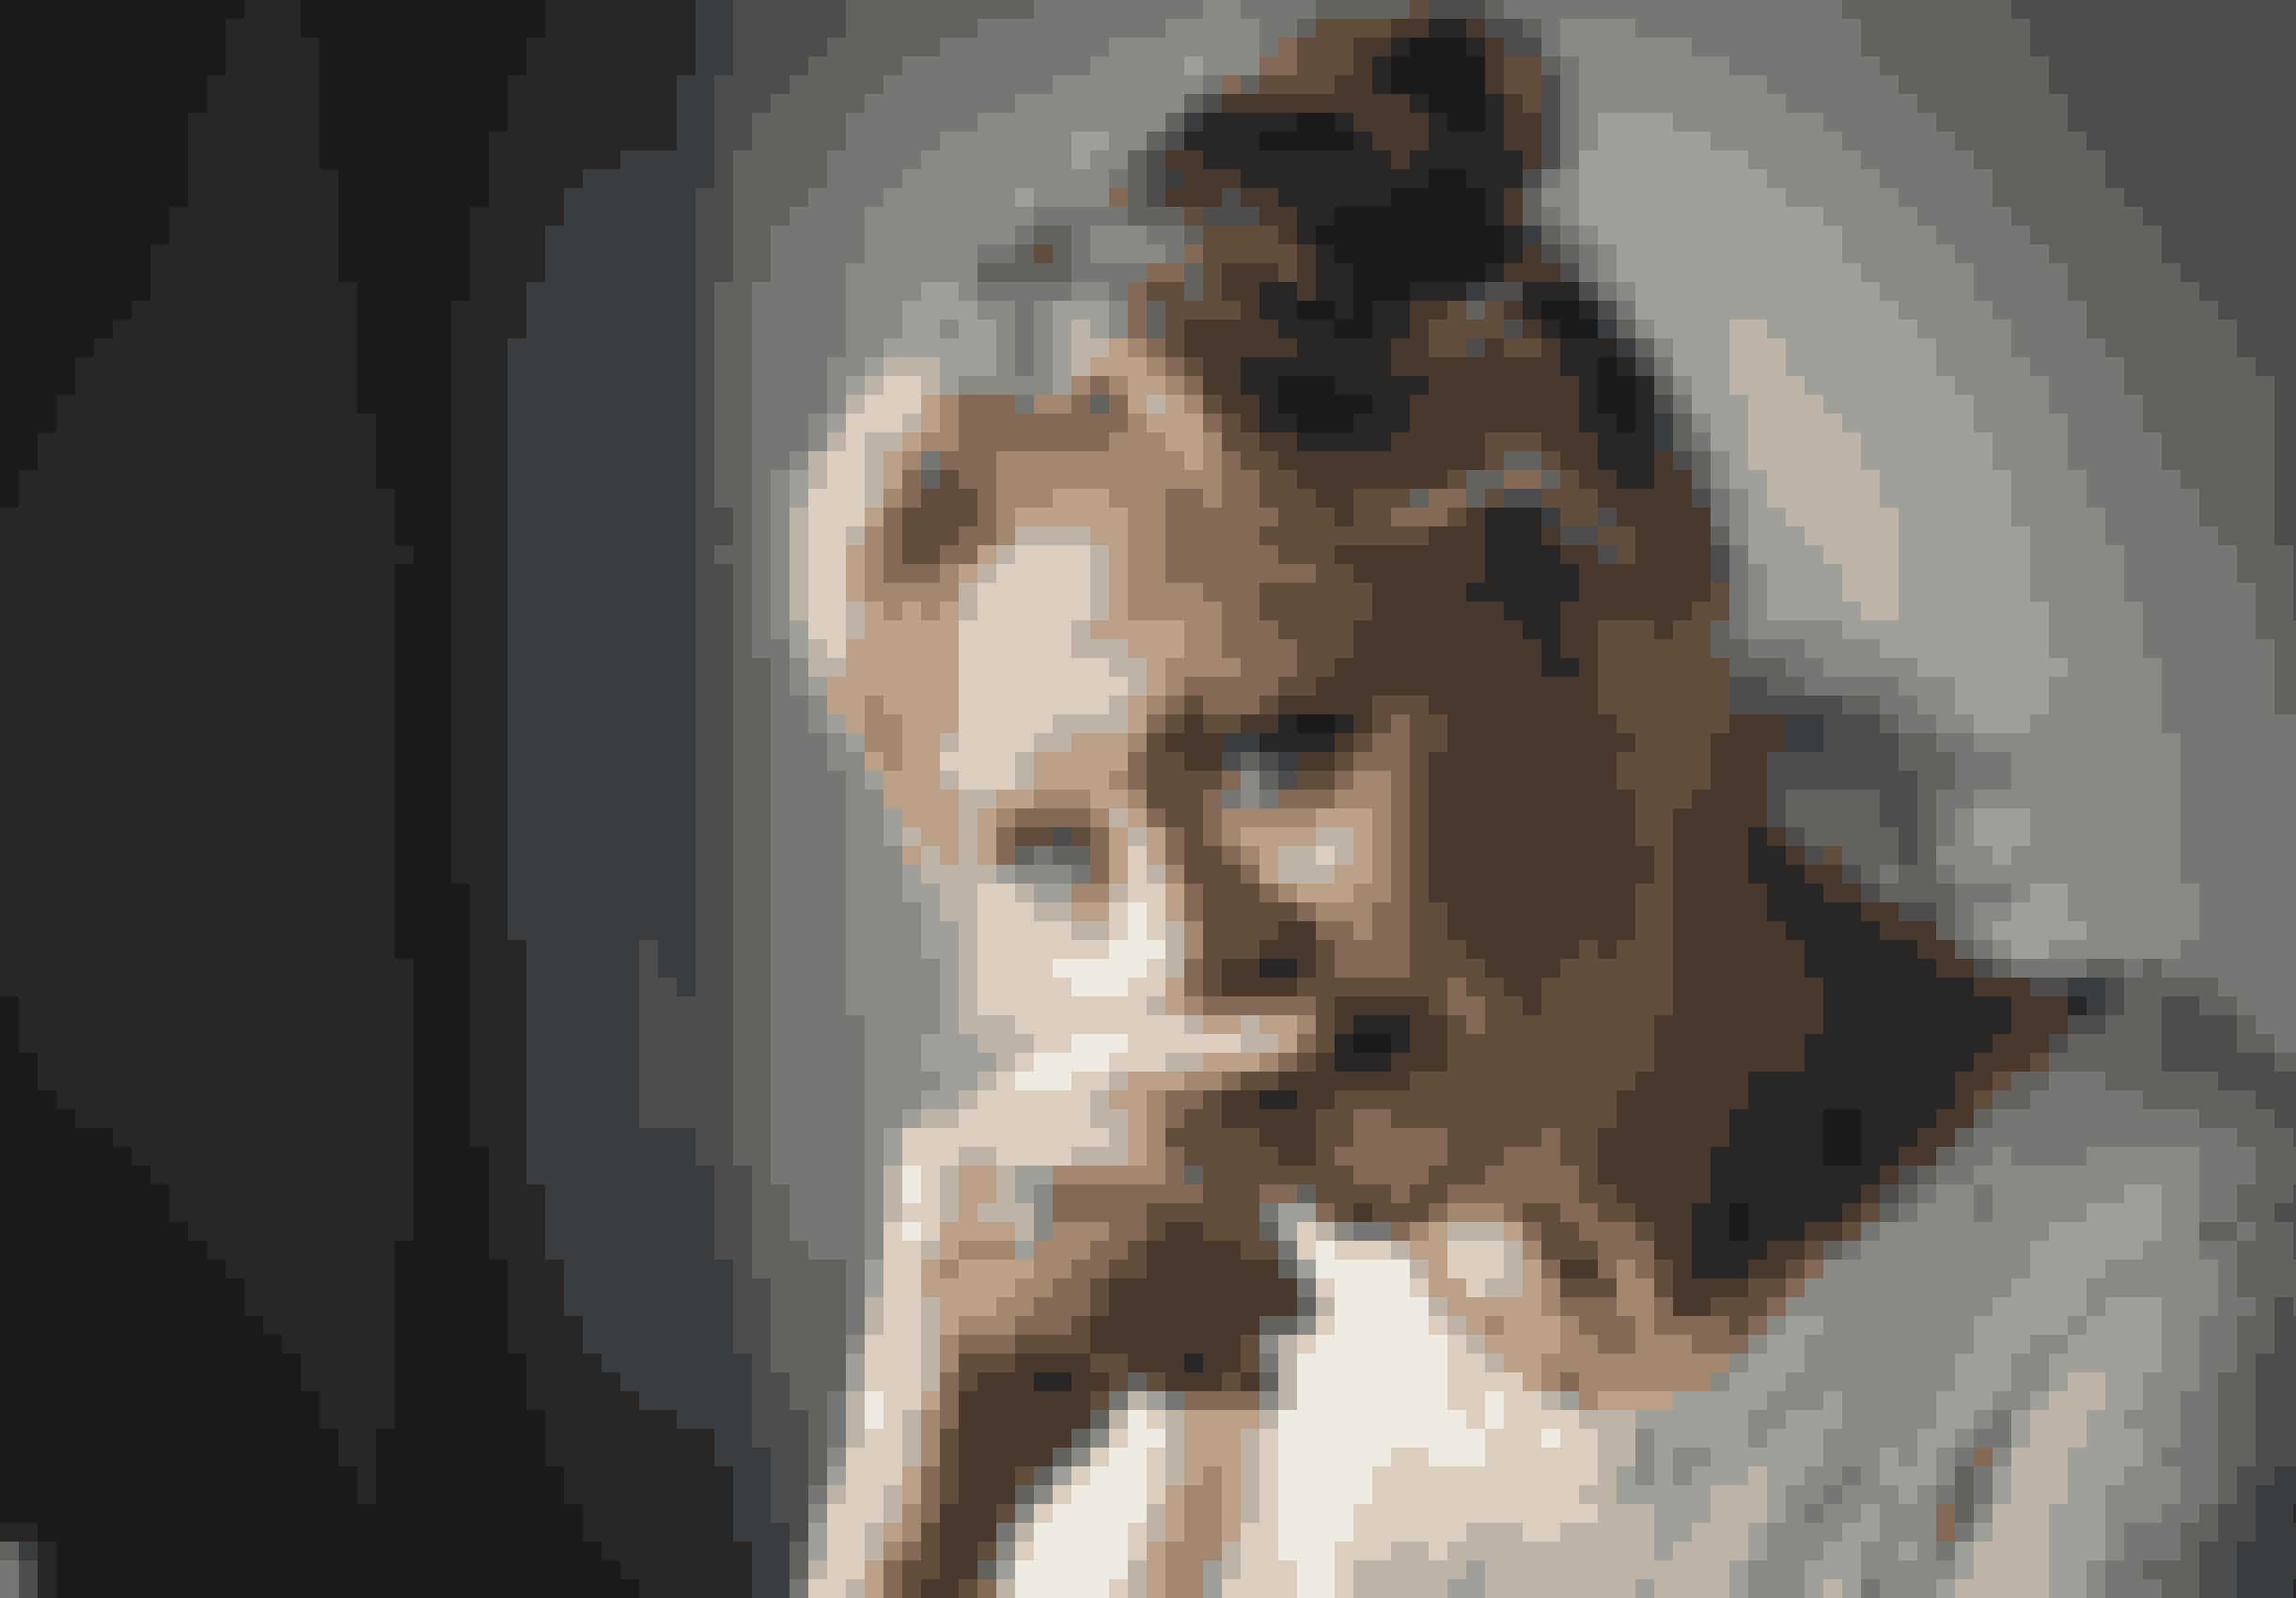 Pernille Højmark mistede sin far. Han tog sit liv, da hun var 13 år gammel.